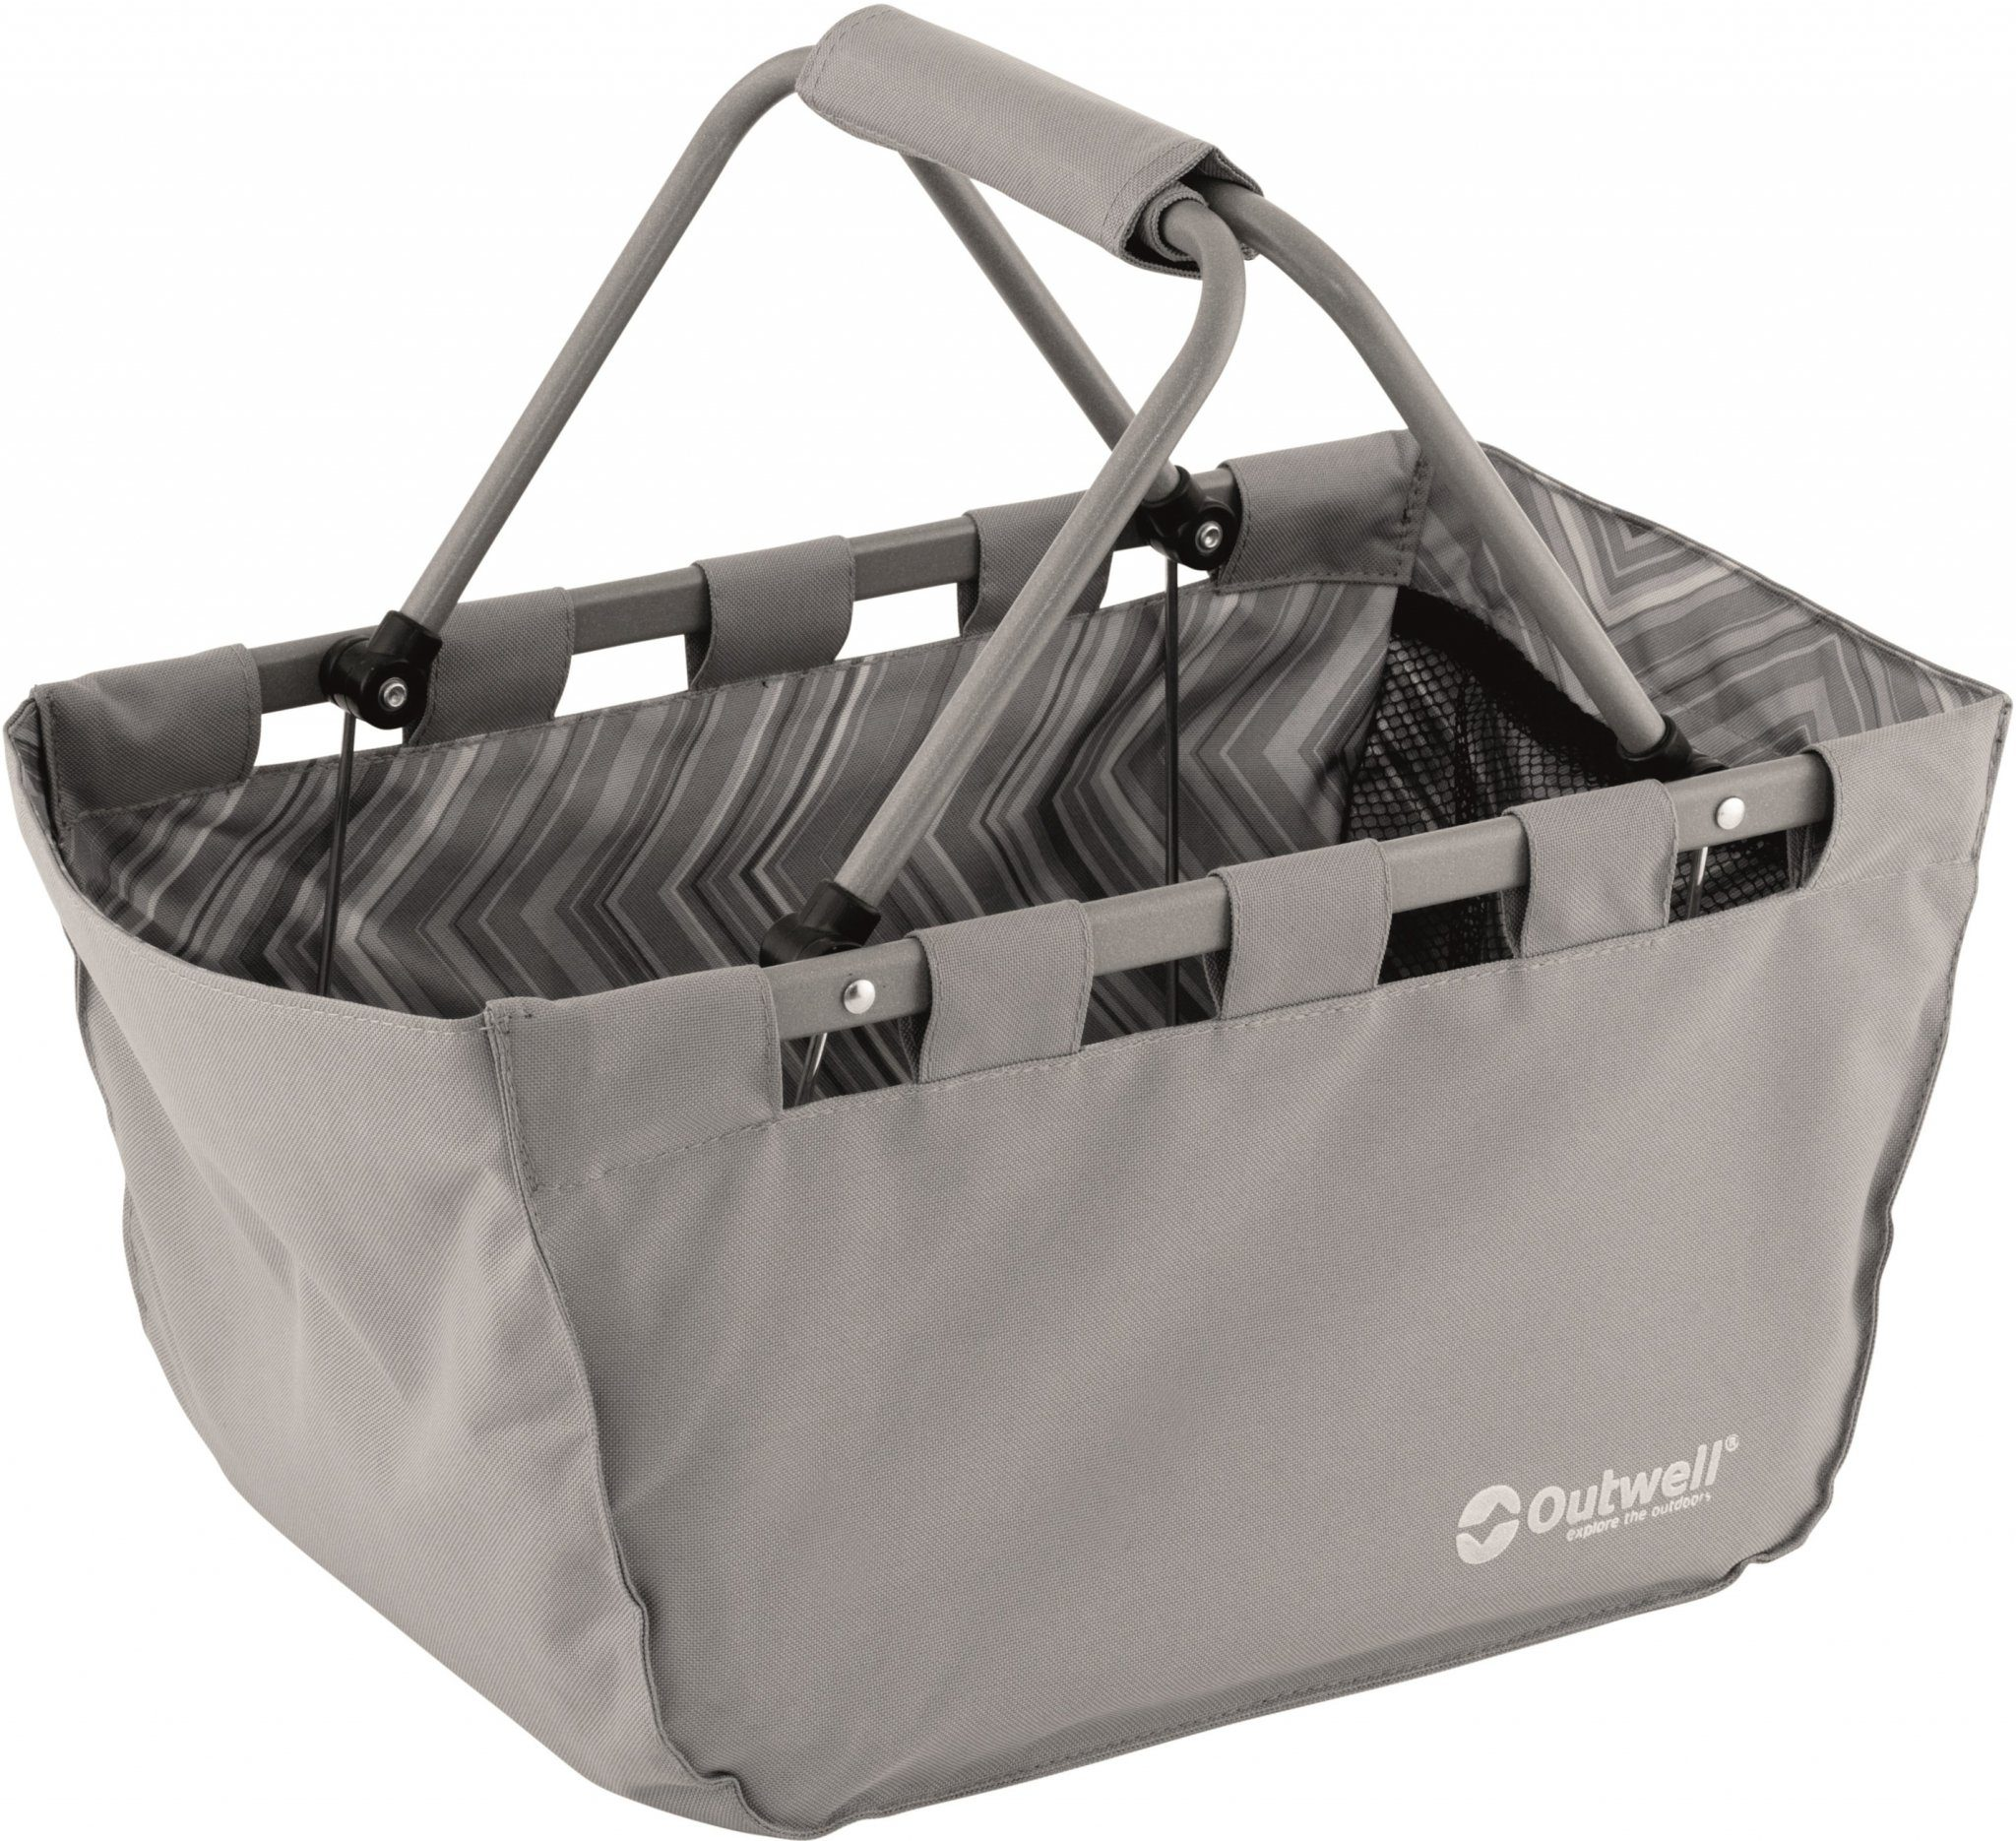 Outwell Campingtruhe & -Kiste »Outwell Bandon Folding Basket«